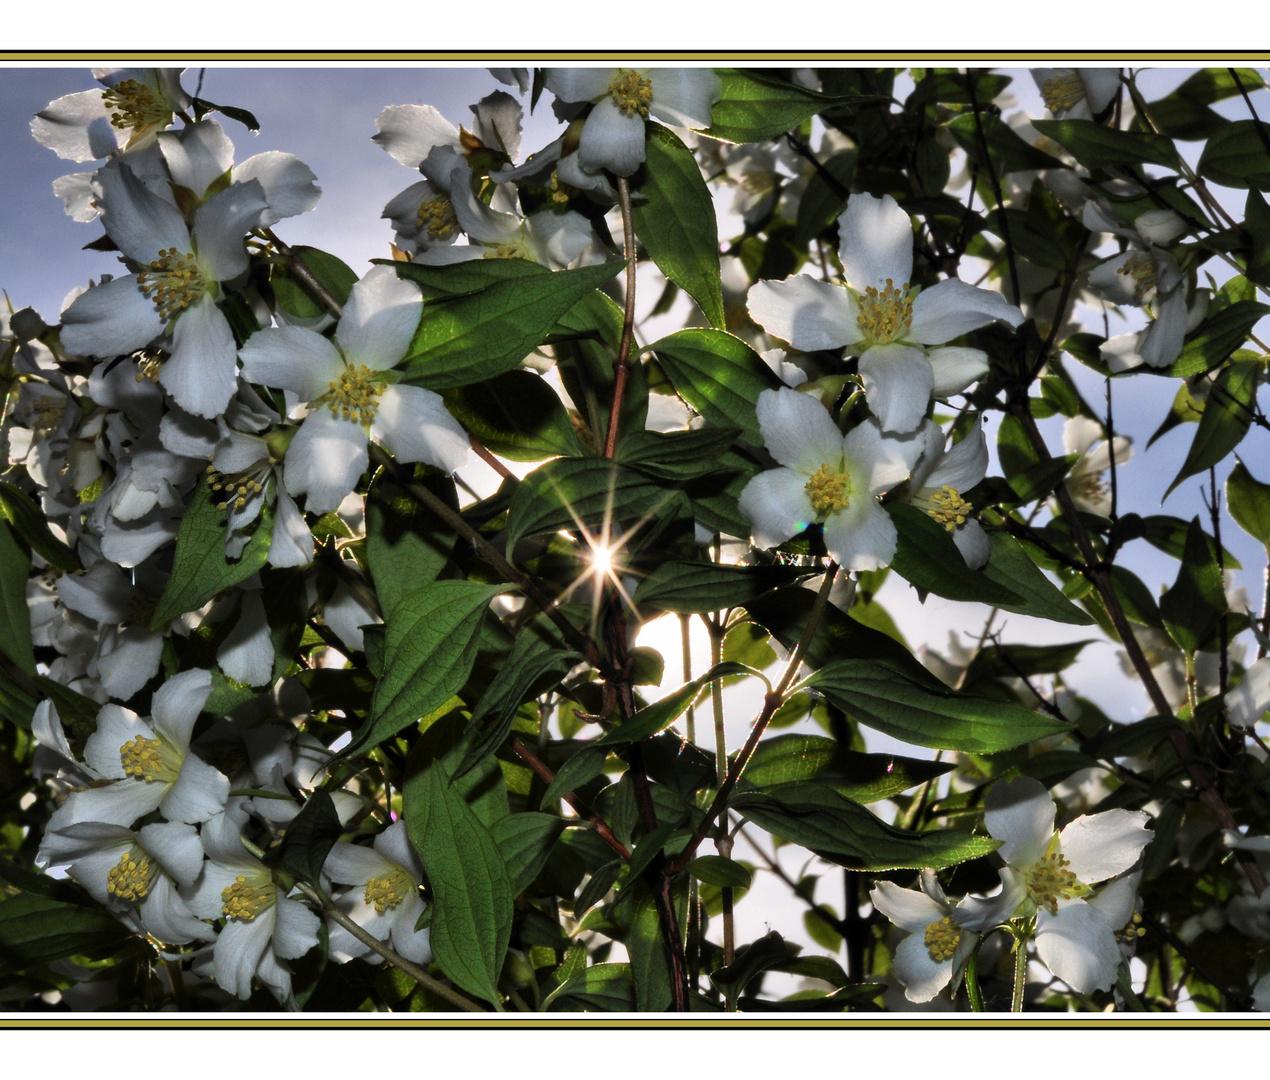 falscher jasmin strauch foto bild pflanzen pilze flechten bl ten kleinpflanzen. Black Bedroom Furniture Sets. Home Design Ideas